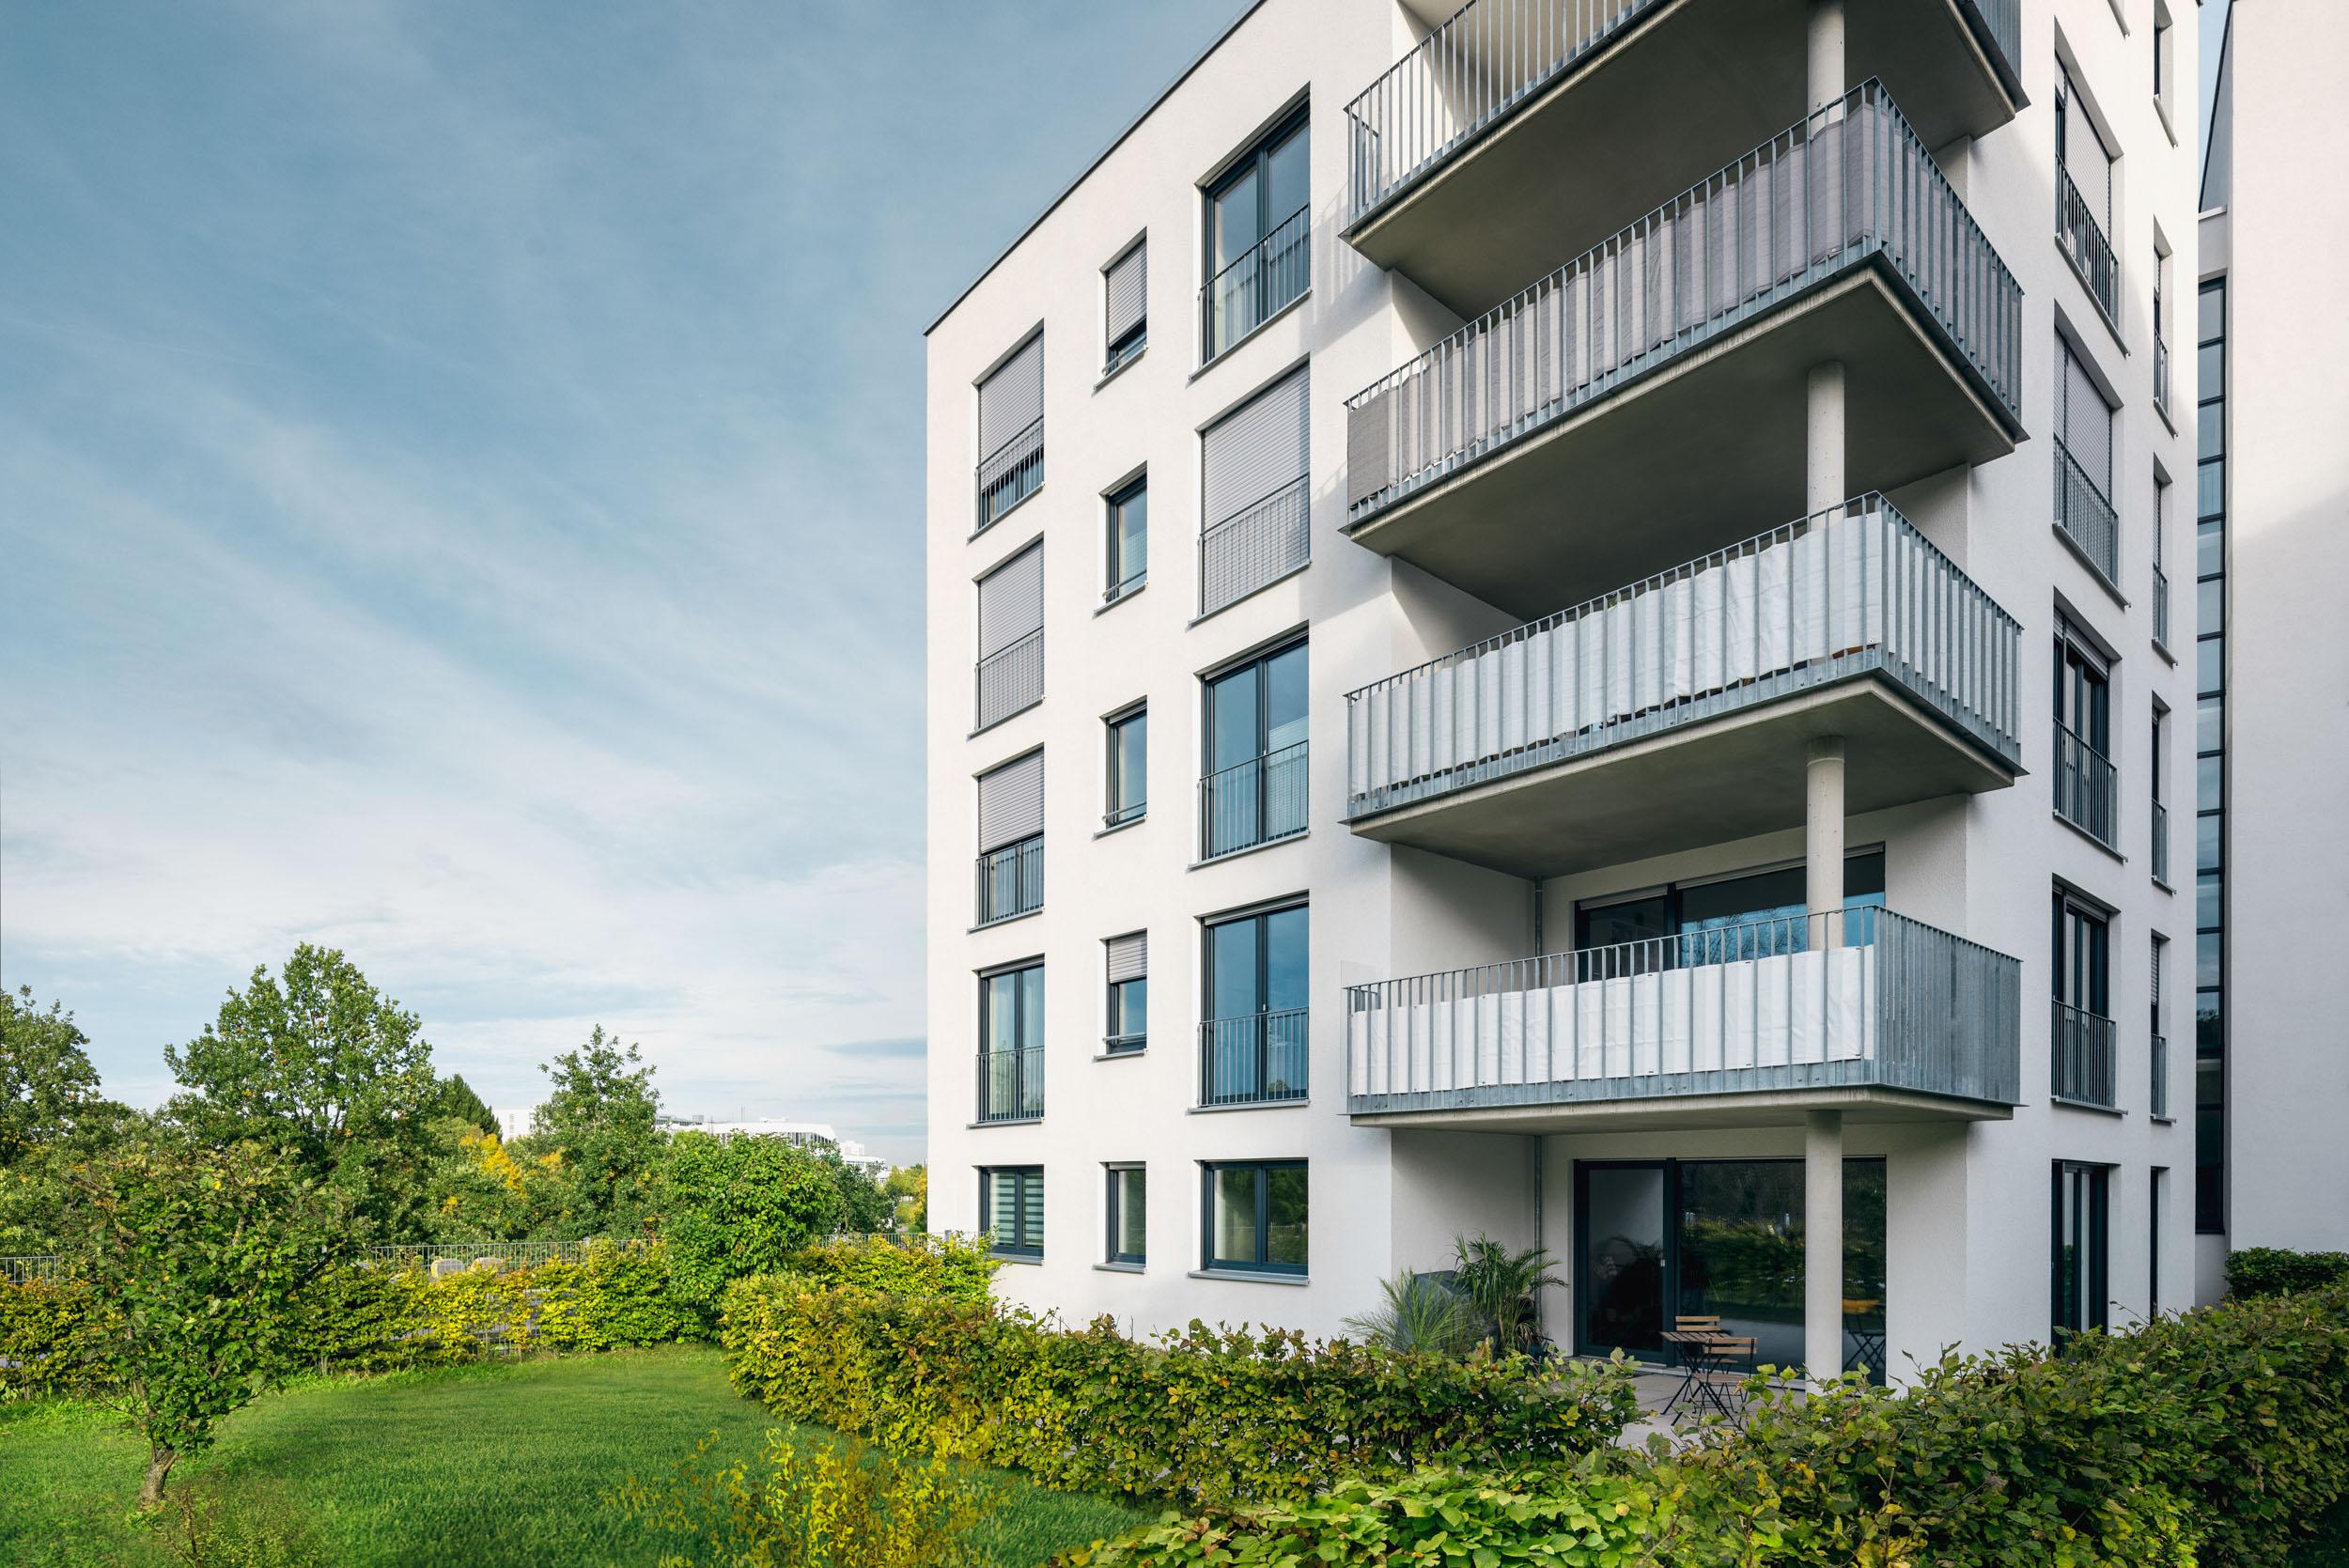 Gustav-Epple-Bauunternehmung-Meluner-Straße-MLX8049